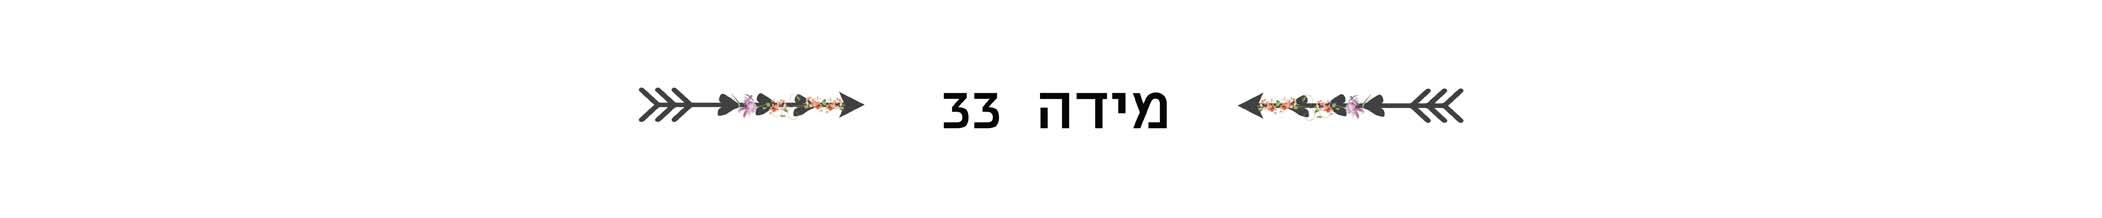 מידה 33